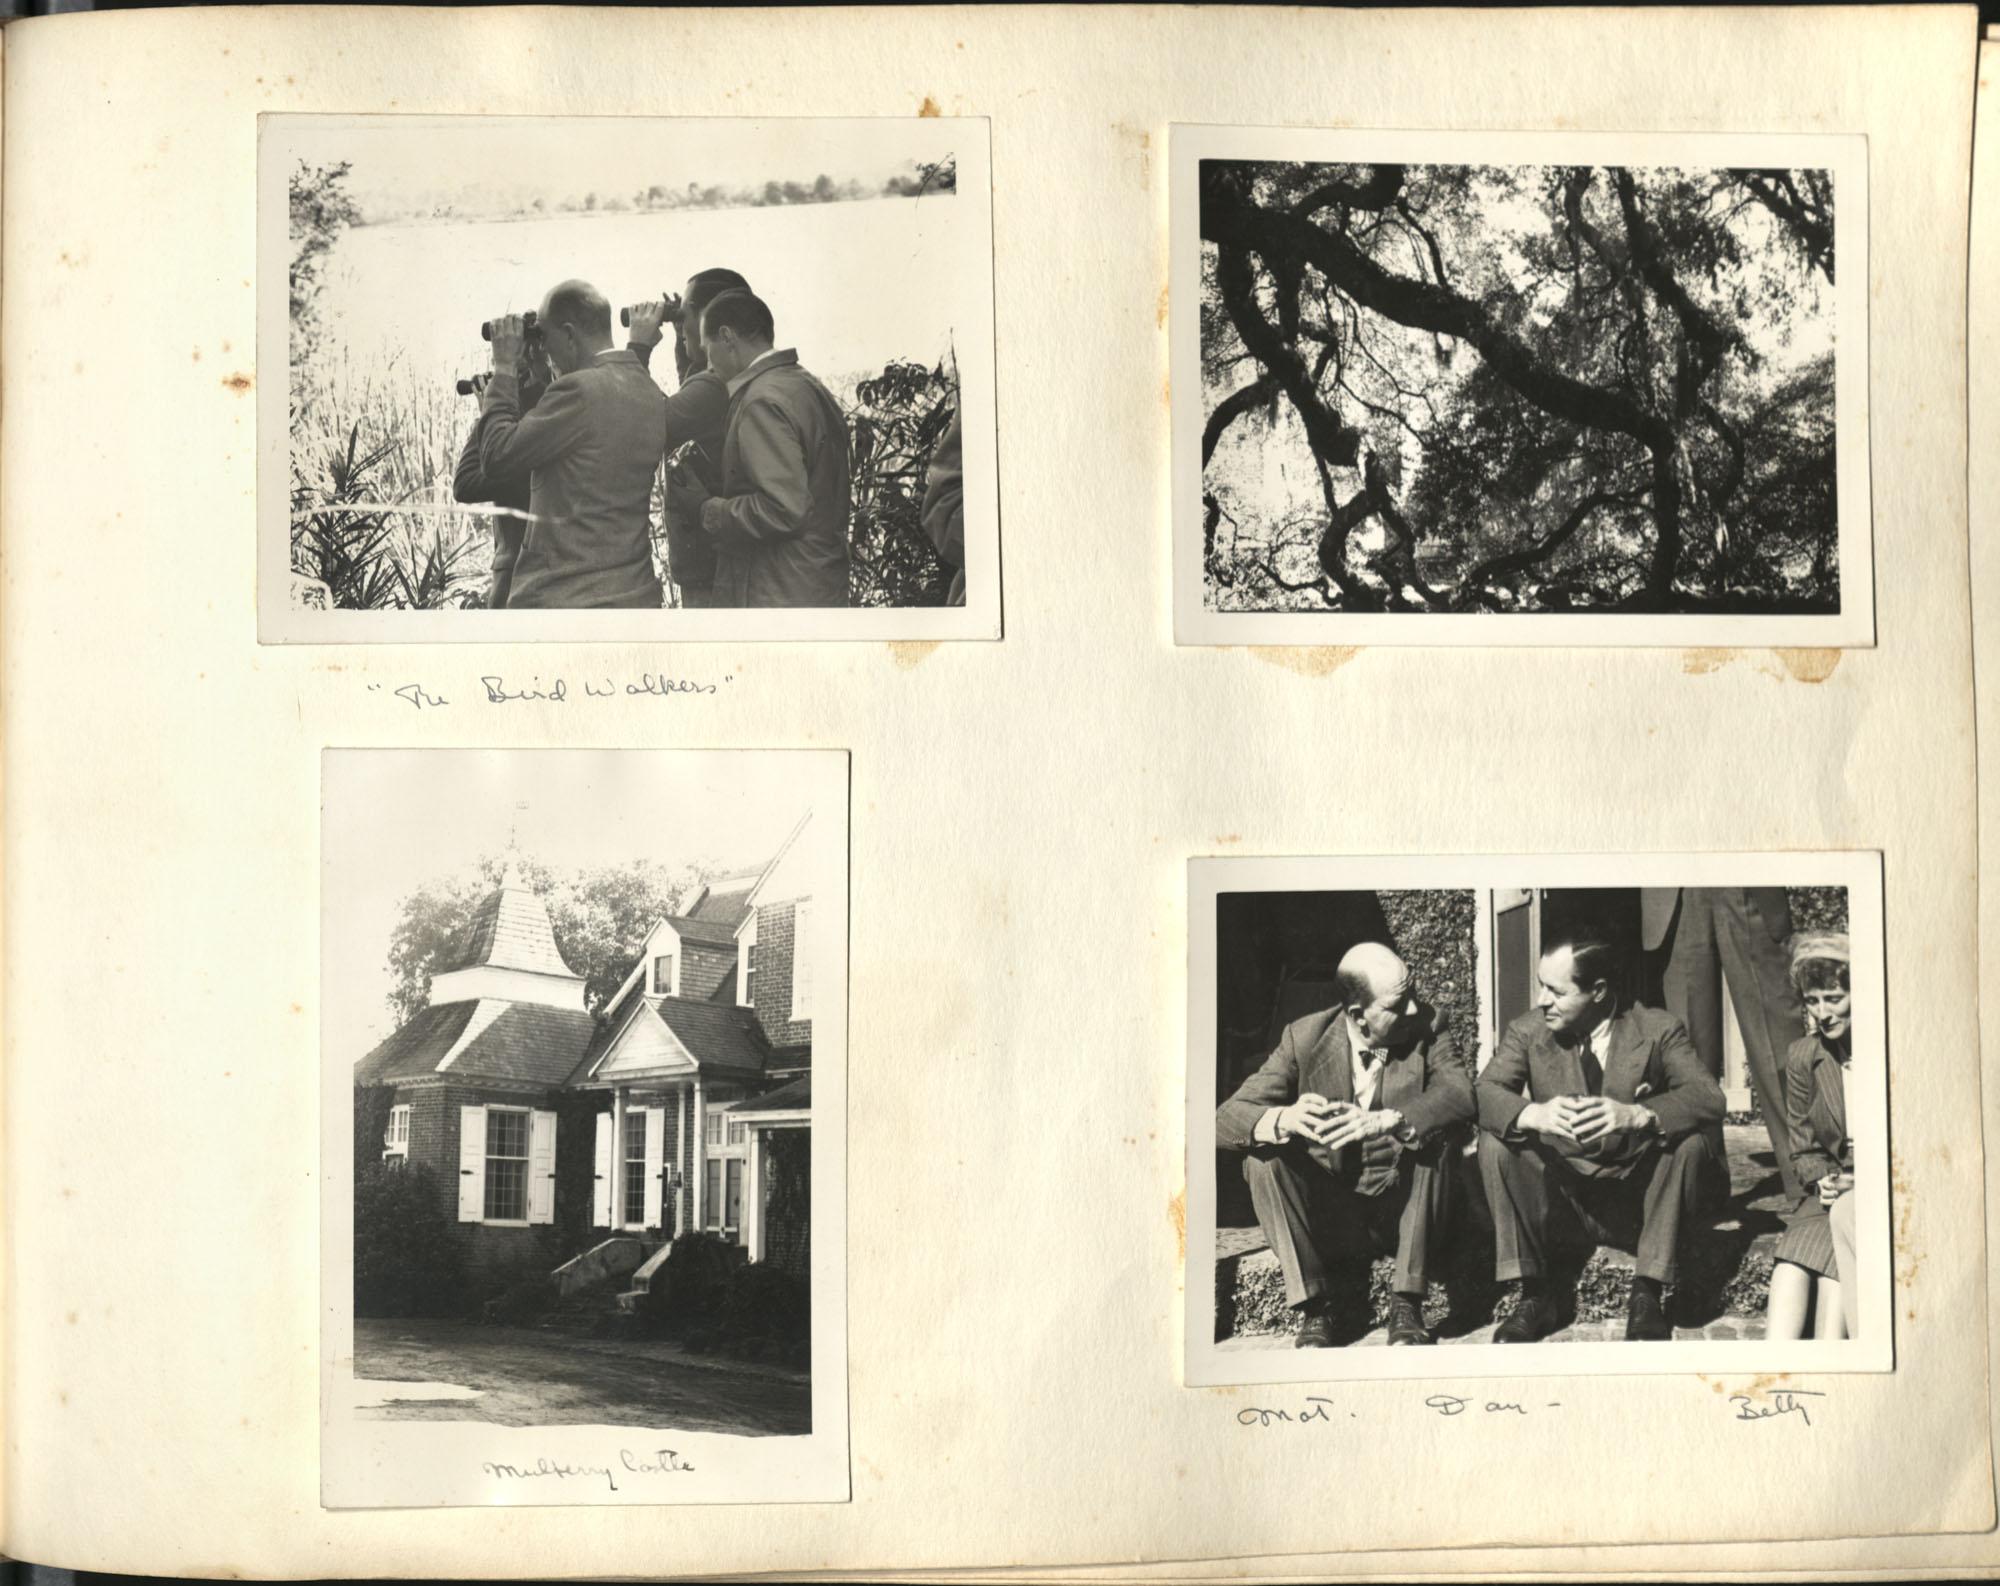 Medway Plantation Photograph Album, 1949, page 111